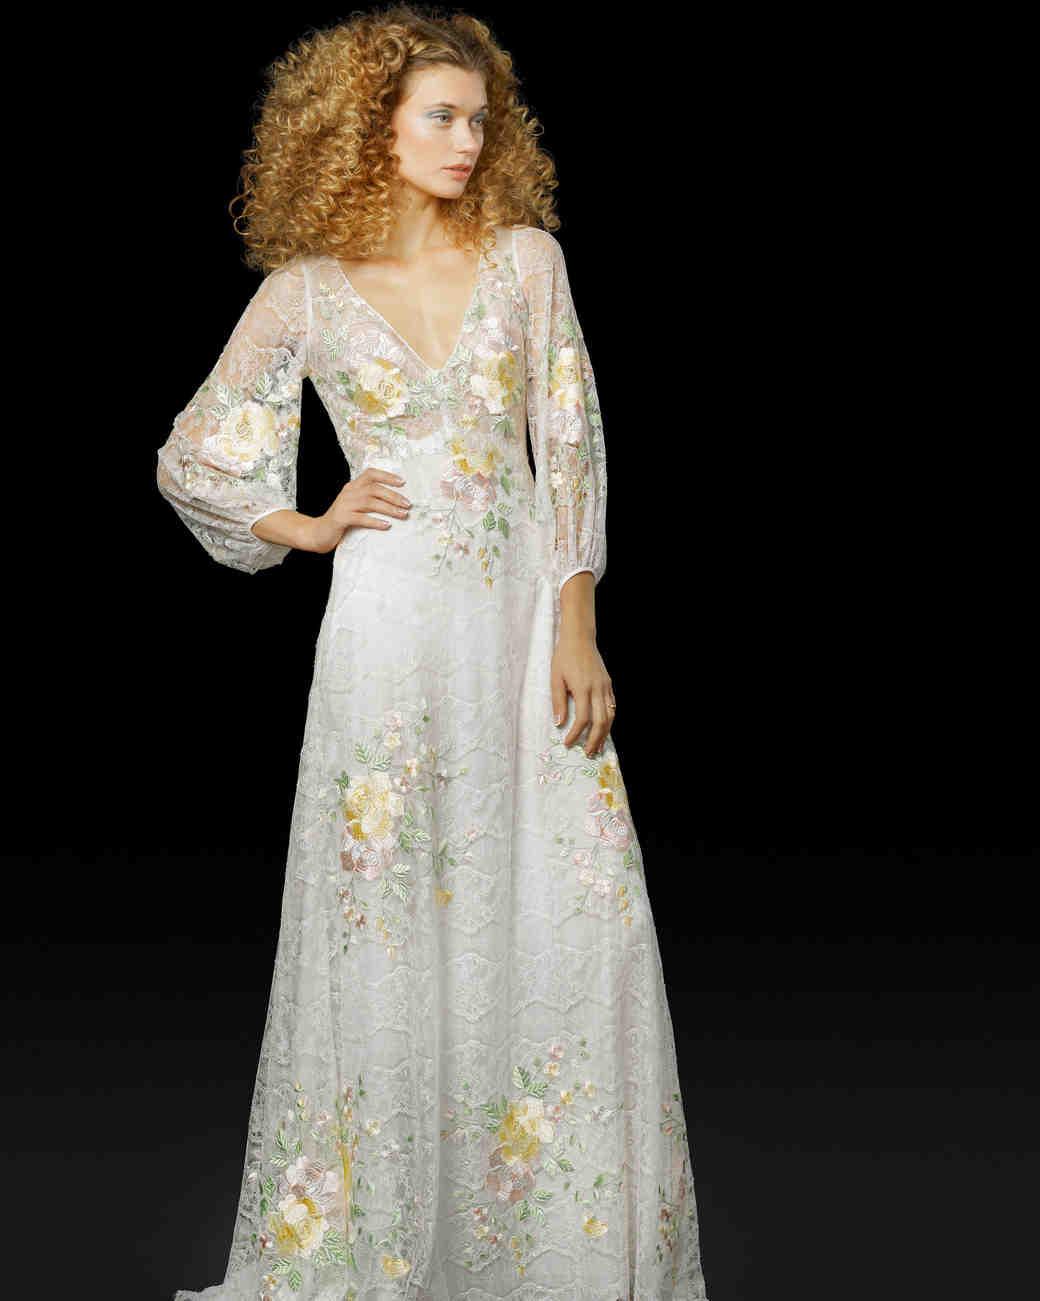 Elizabeth fillmore fall 2017 wedding dress collection for Fall wedding dresses 2017